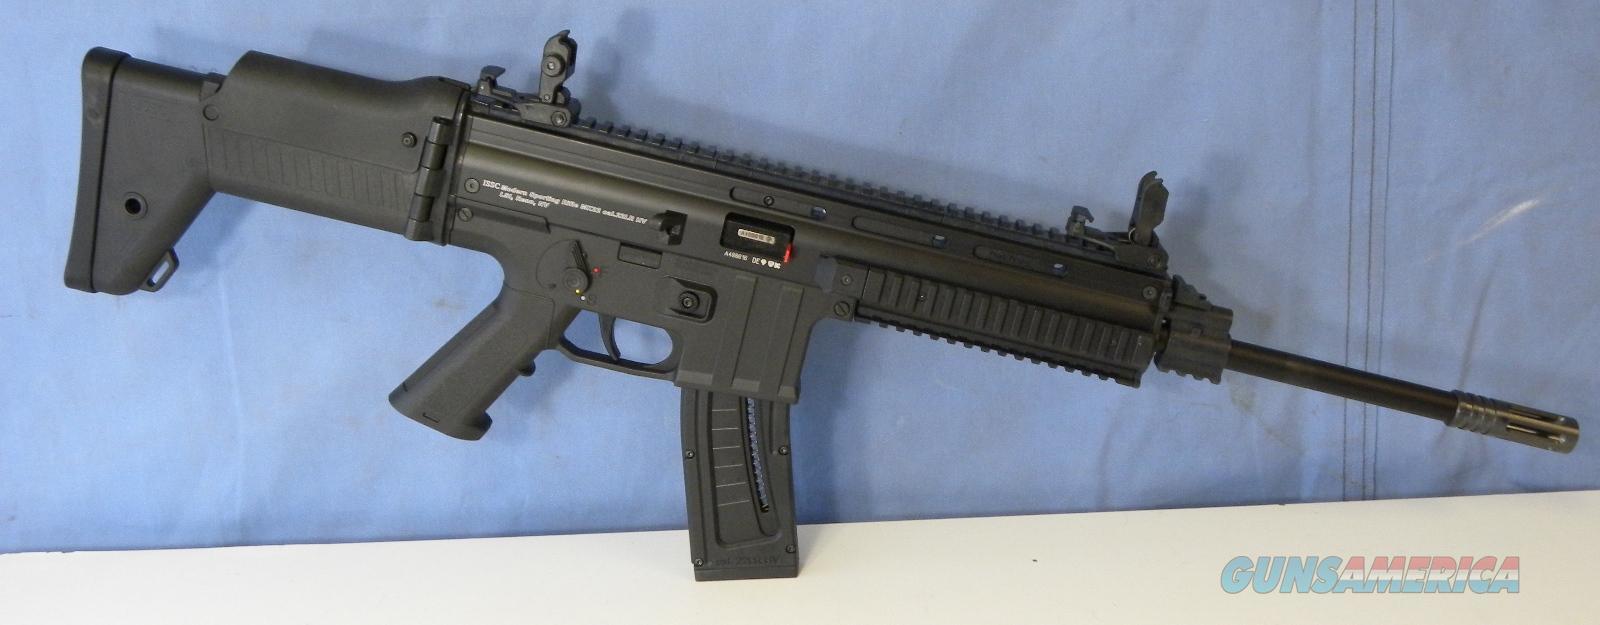 ISSC MK22 Black (SCAR Clone)  Guns > Rifles > ISSC Rifles